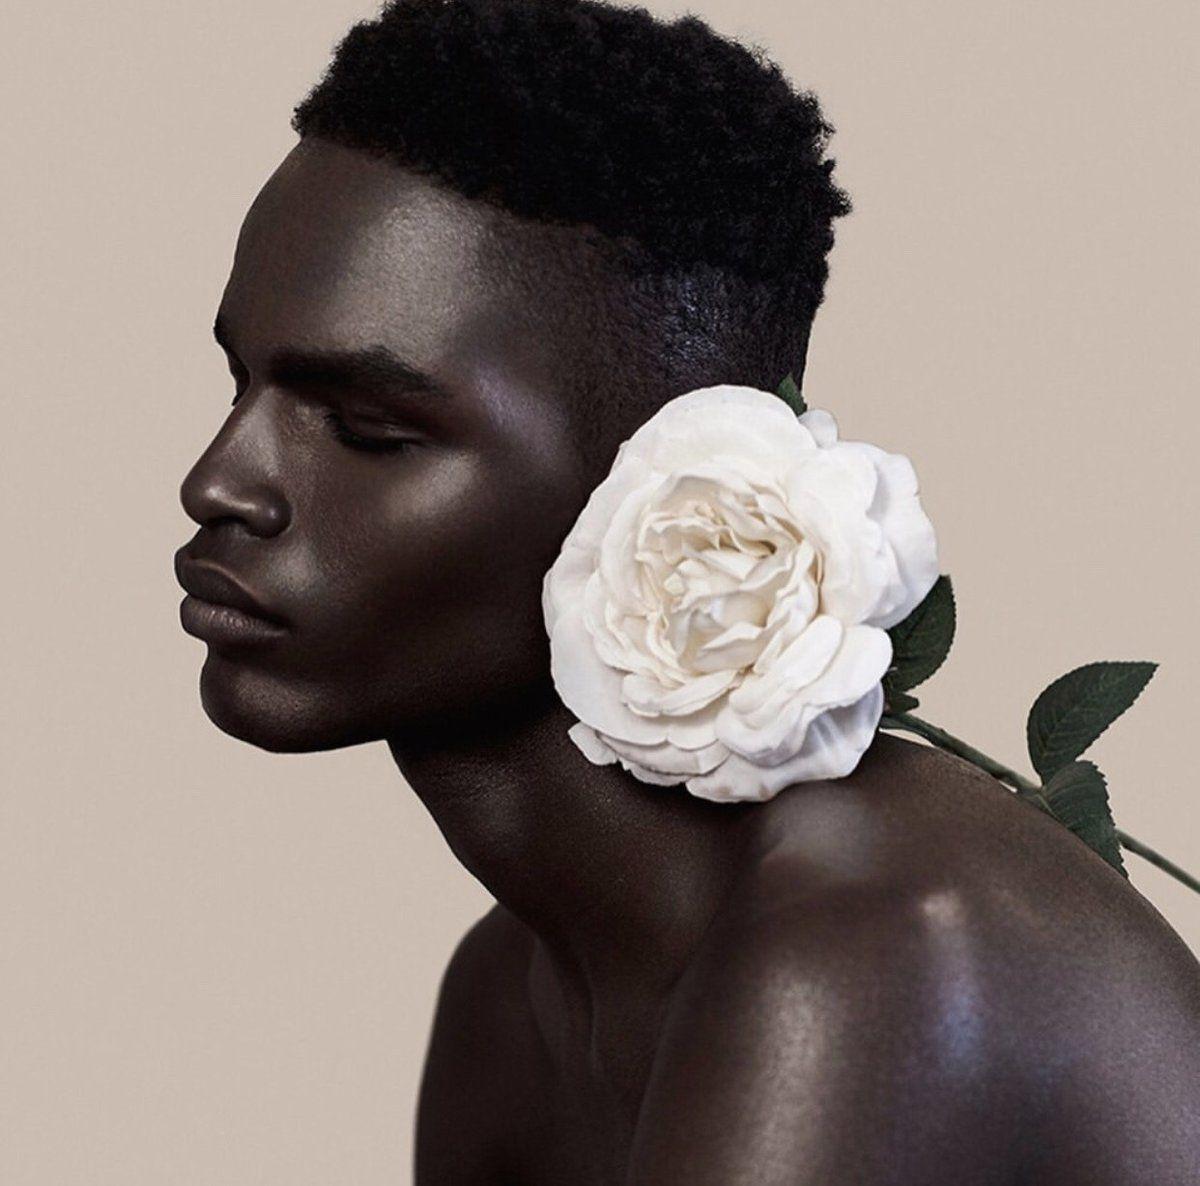 Black Fashion Models Poses: Portrait, Photography Poses